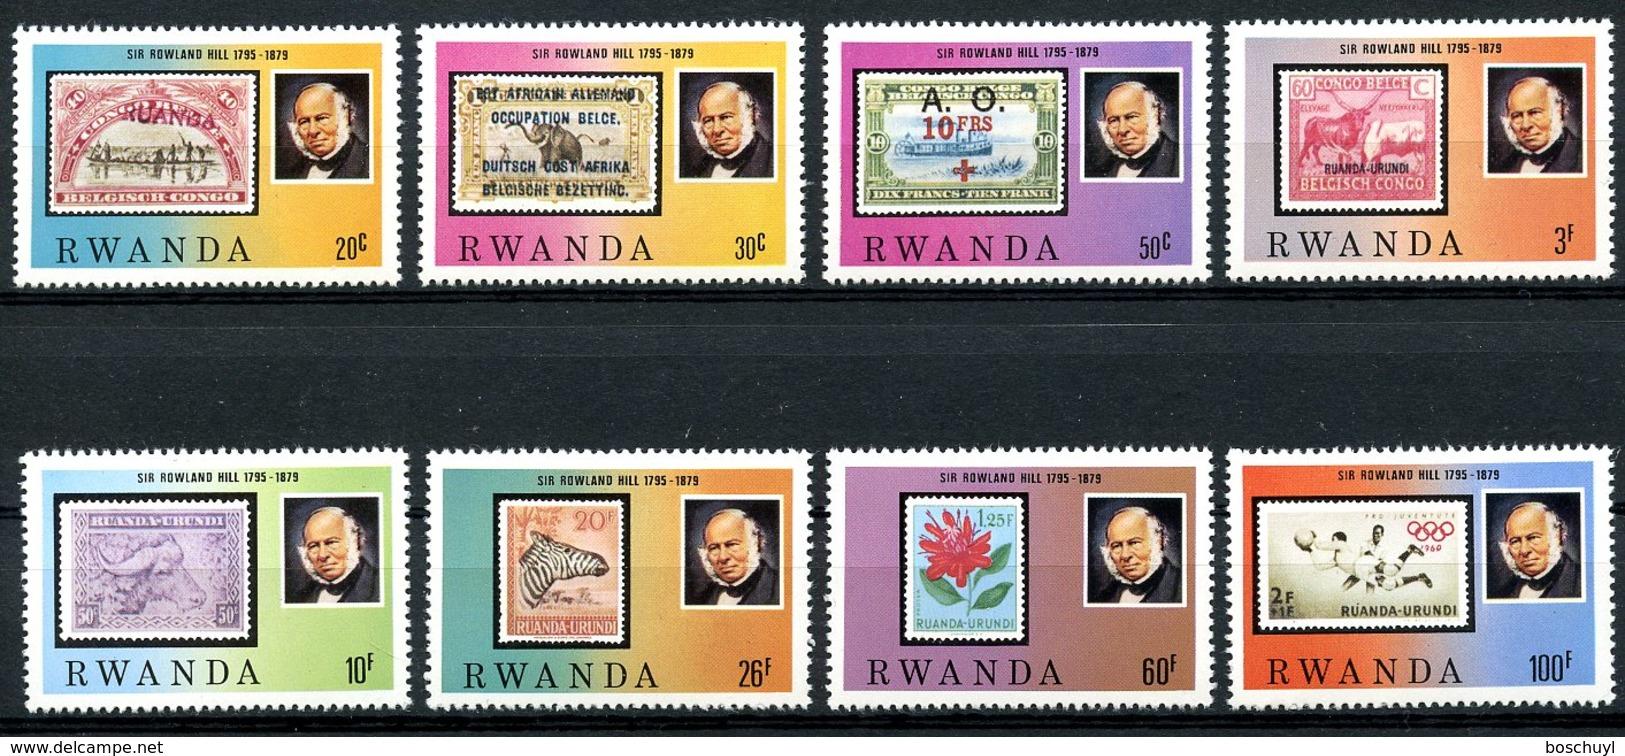 Rwanda, 1979, Sir Rowland Hill, UPU, Stamps On Stamps, MNH, Michel 1011-1018 - Rwanda